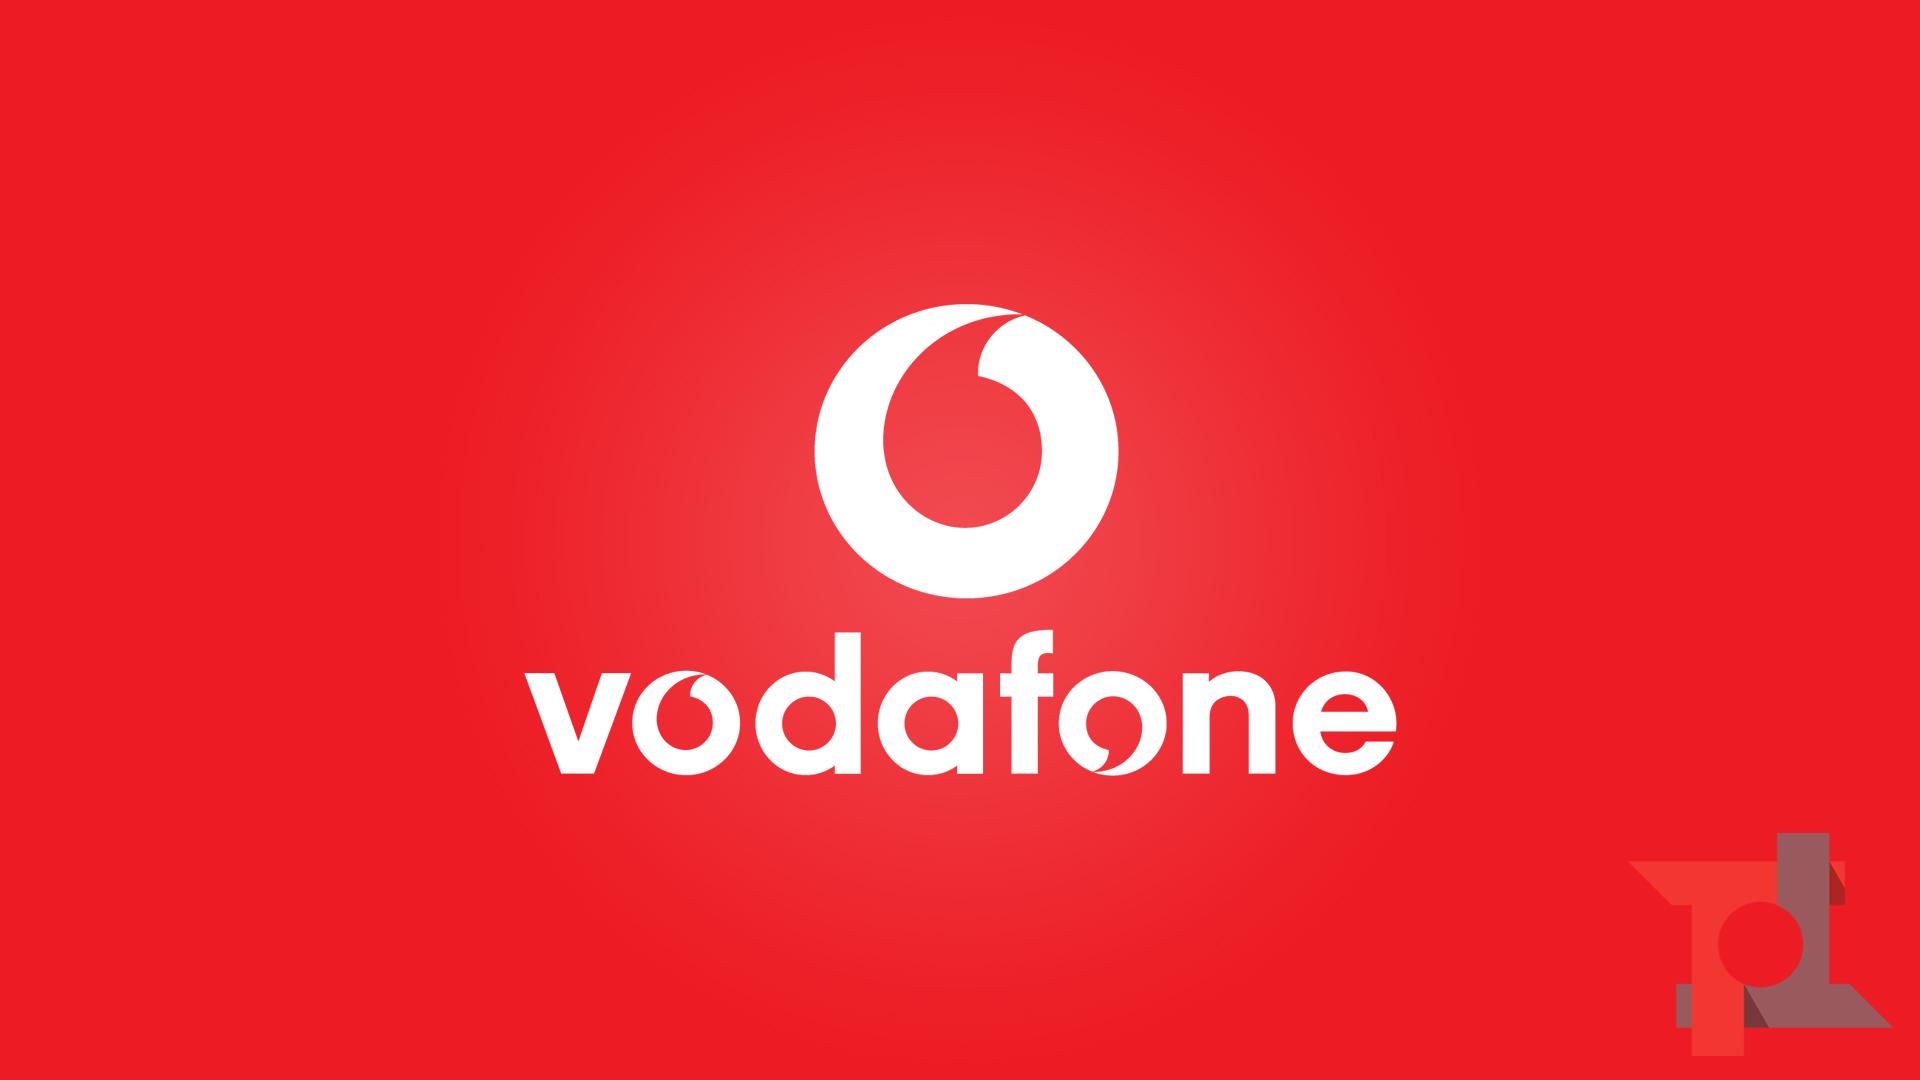 Migliori offerte fibra e ADSL di TIM, Vodafone, Fastweb, WINDTRE e Tiscali 3